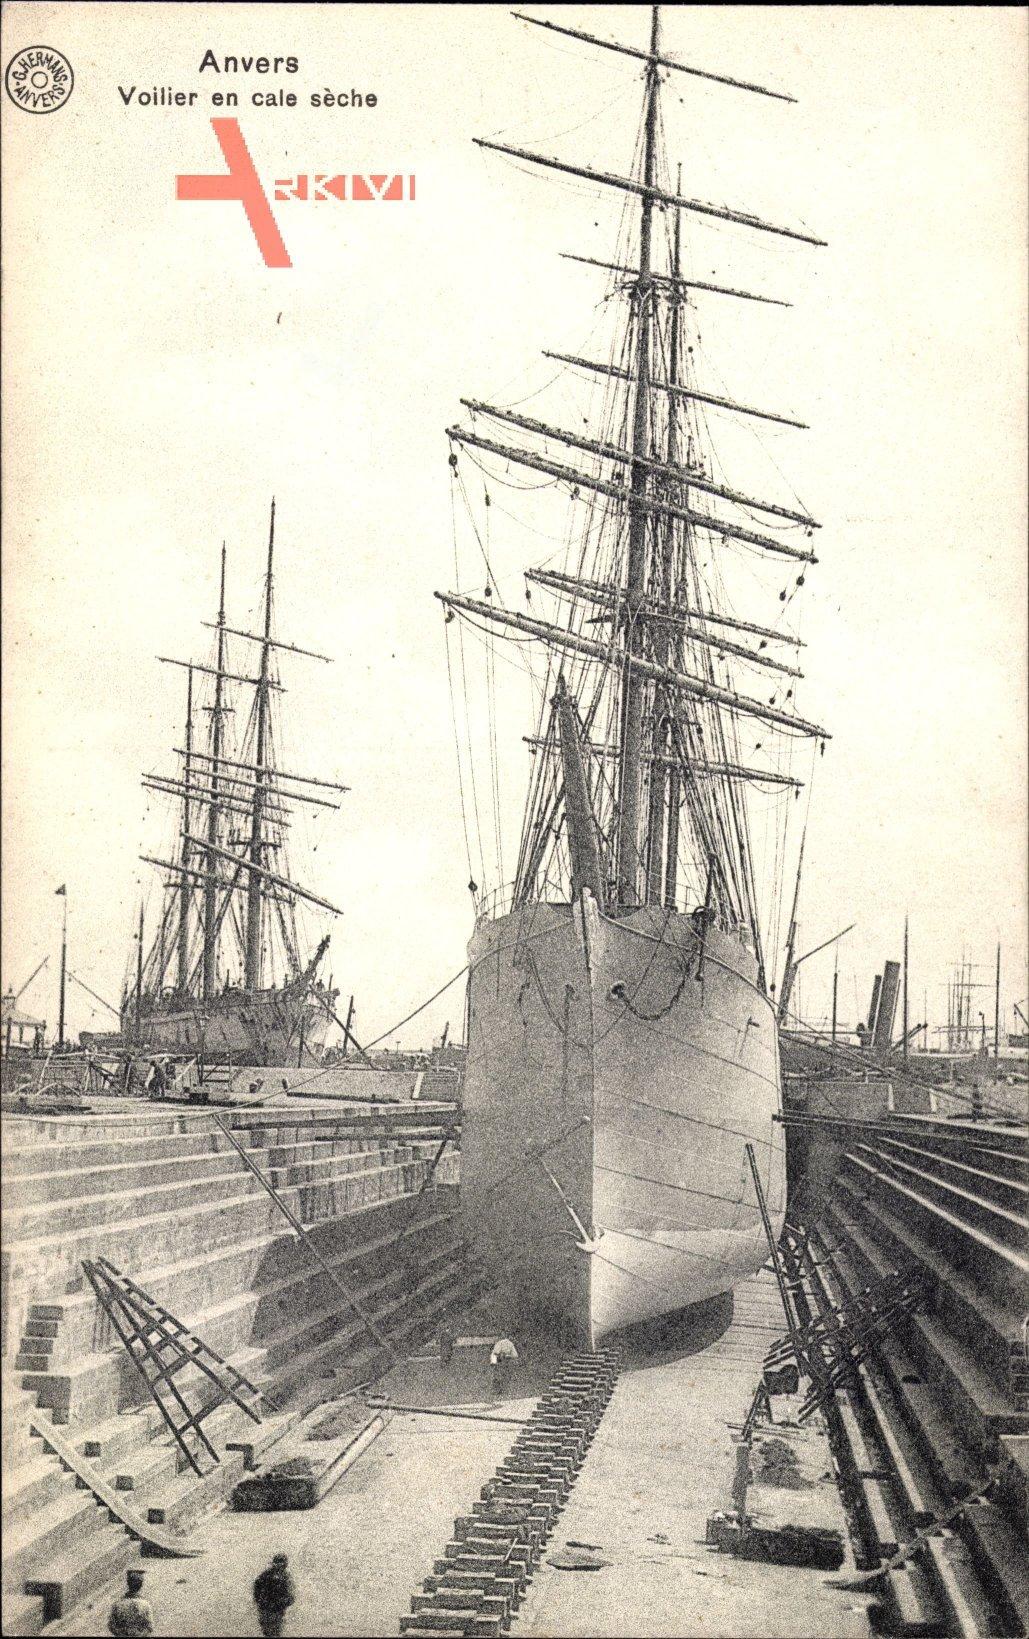 Antwerpen Flandern, Voilier en cale sèche, Segelschiff im Trockendock